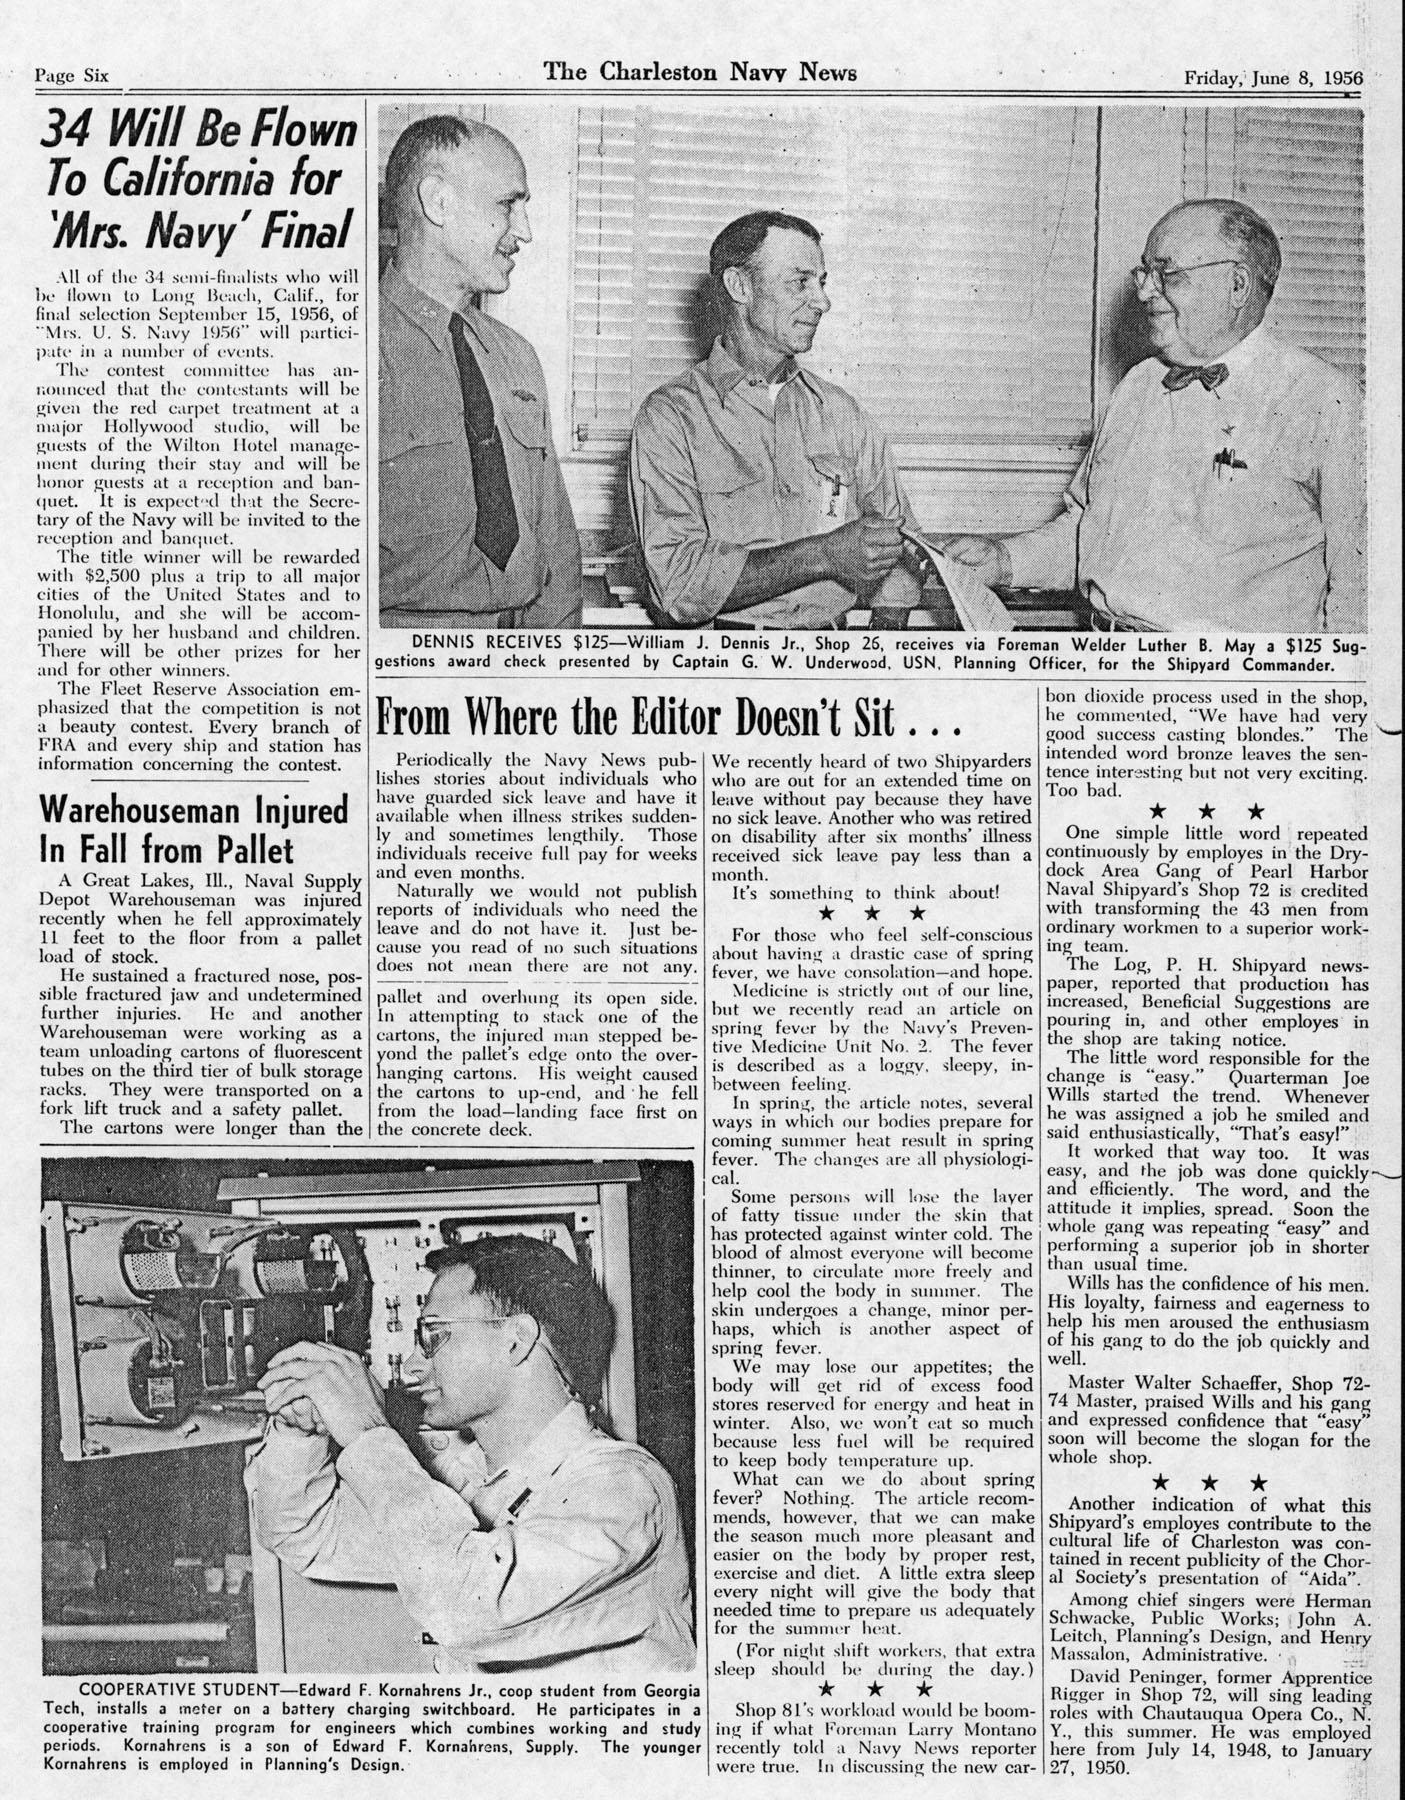 The Charleston Navy News, Volume 14, Edition 23, page vi